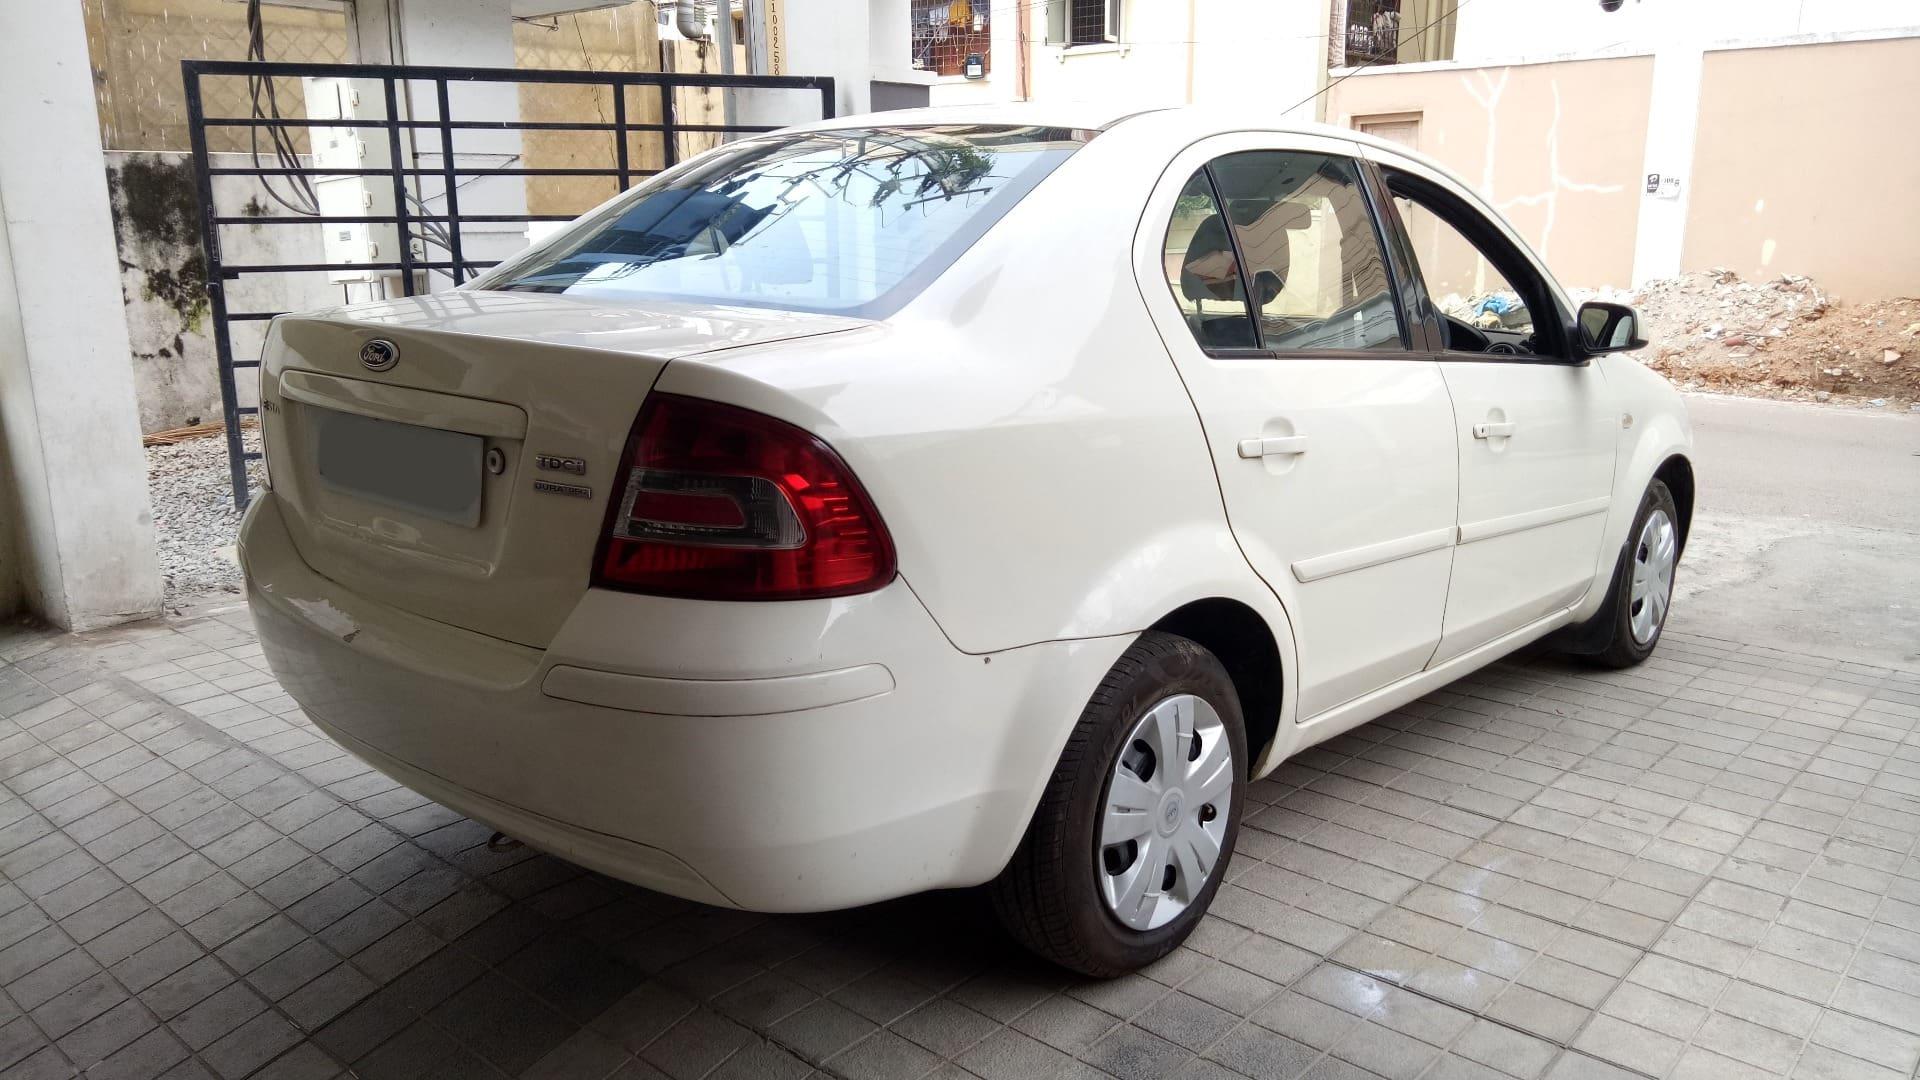 Ford Fiesta 2004-2008 1.4 ZXi TDCi Limited Edition